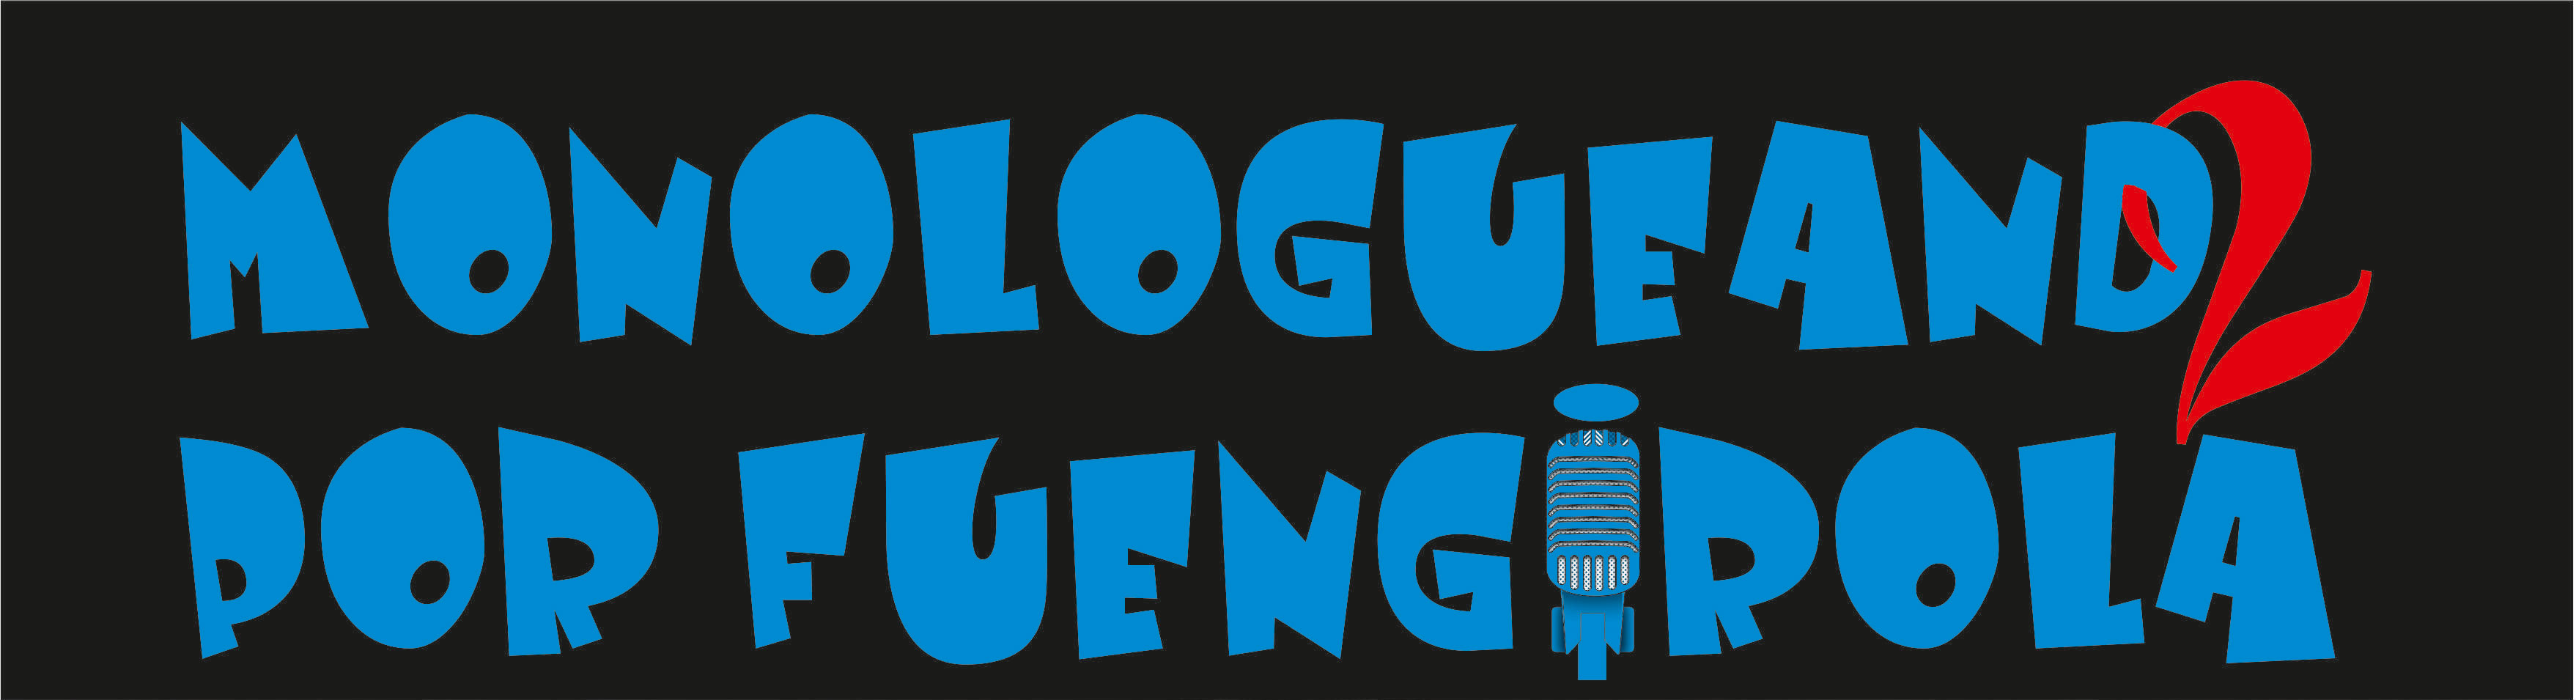 Monologueando por Fuengirola 2